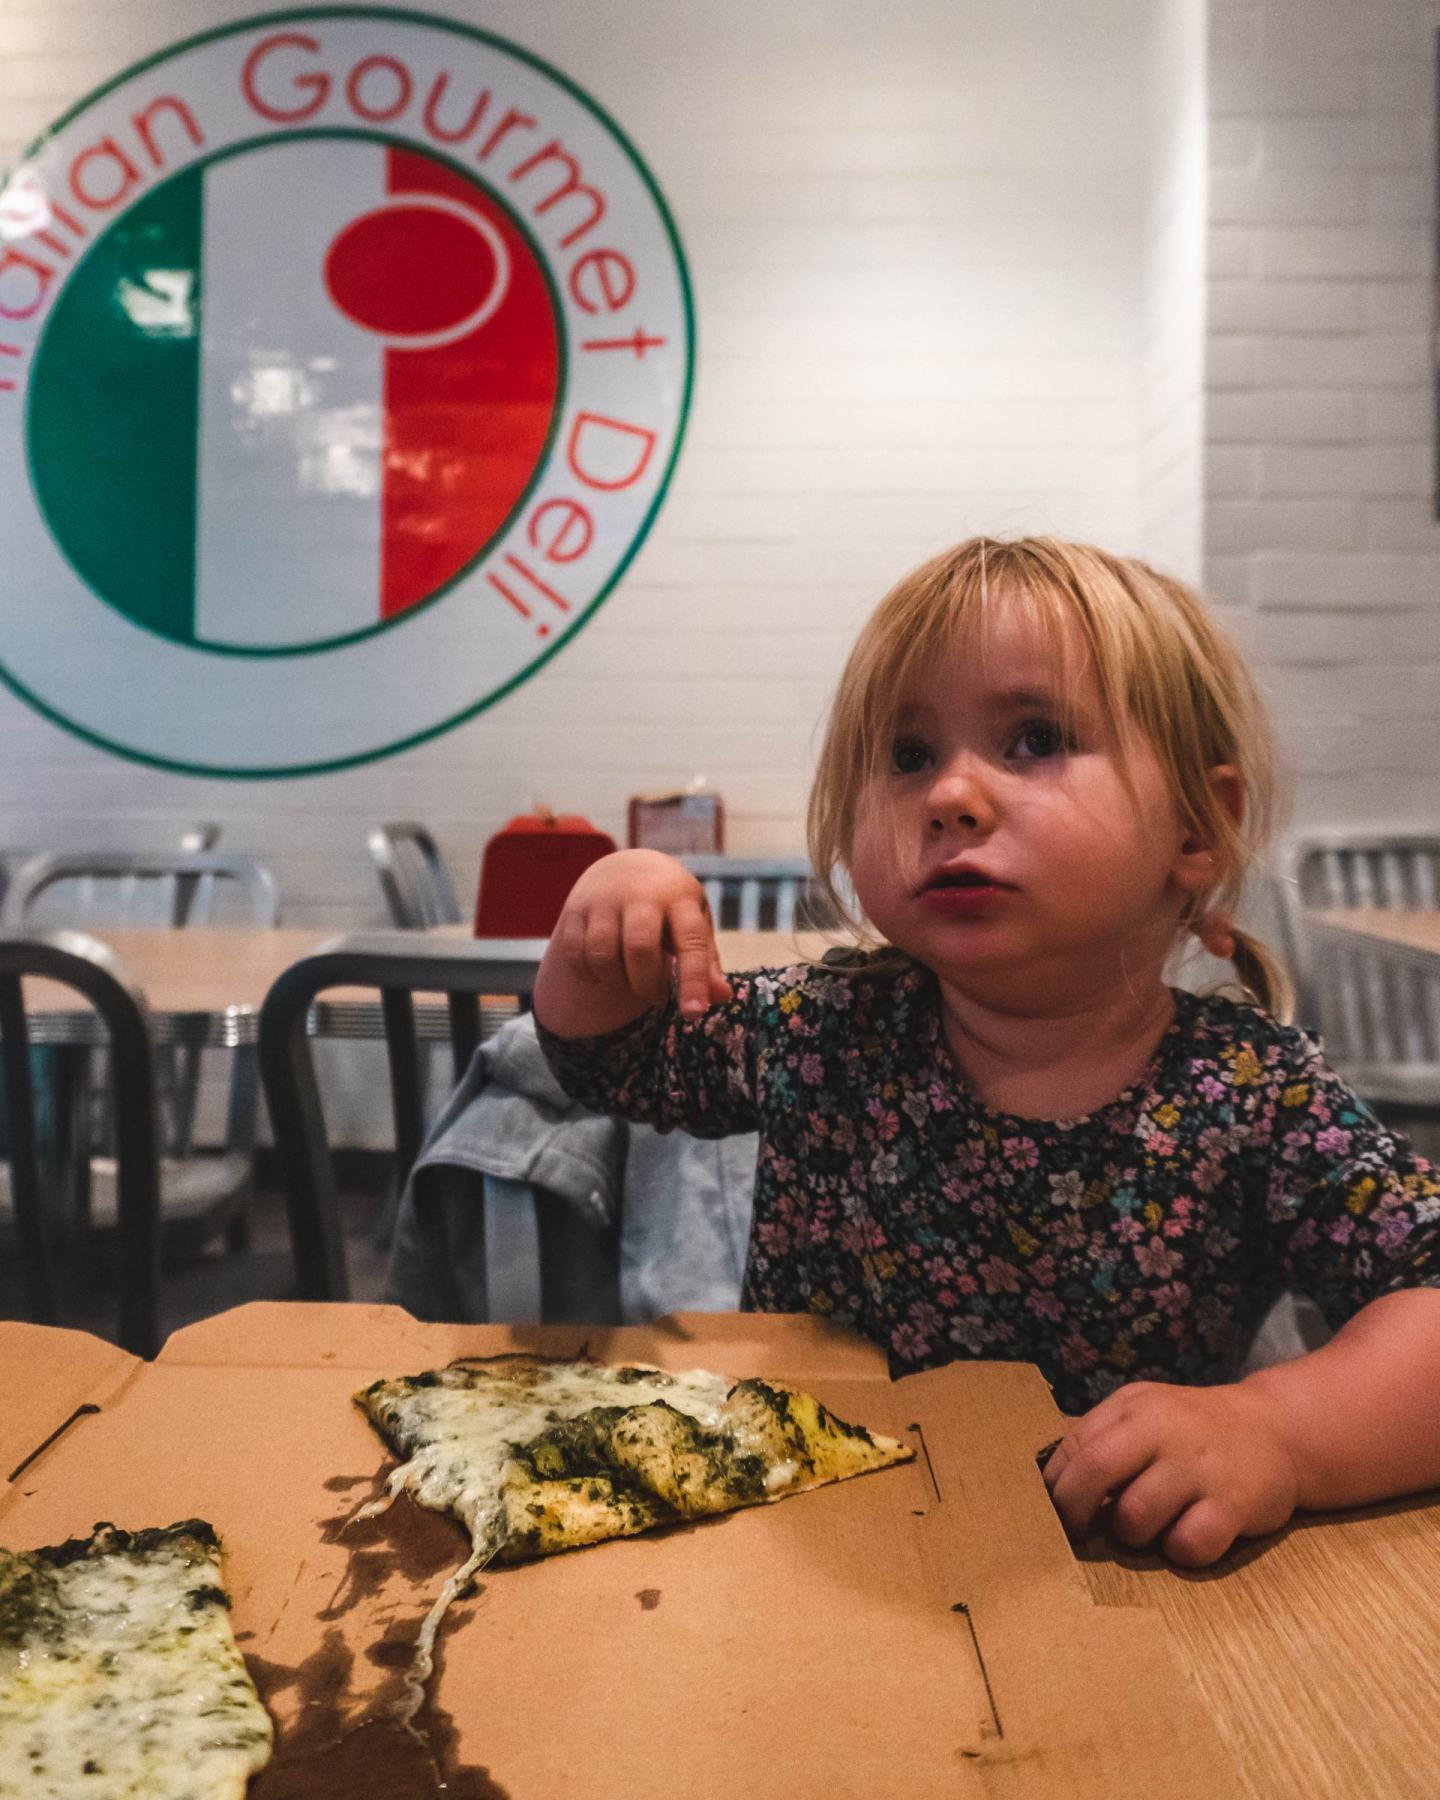 pesto pizza in washington dc